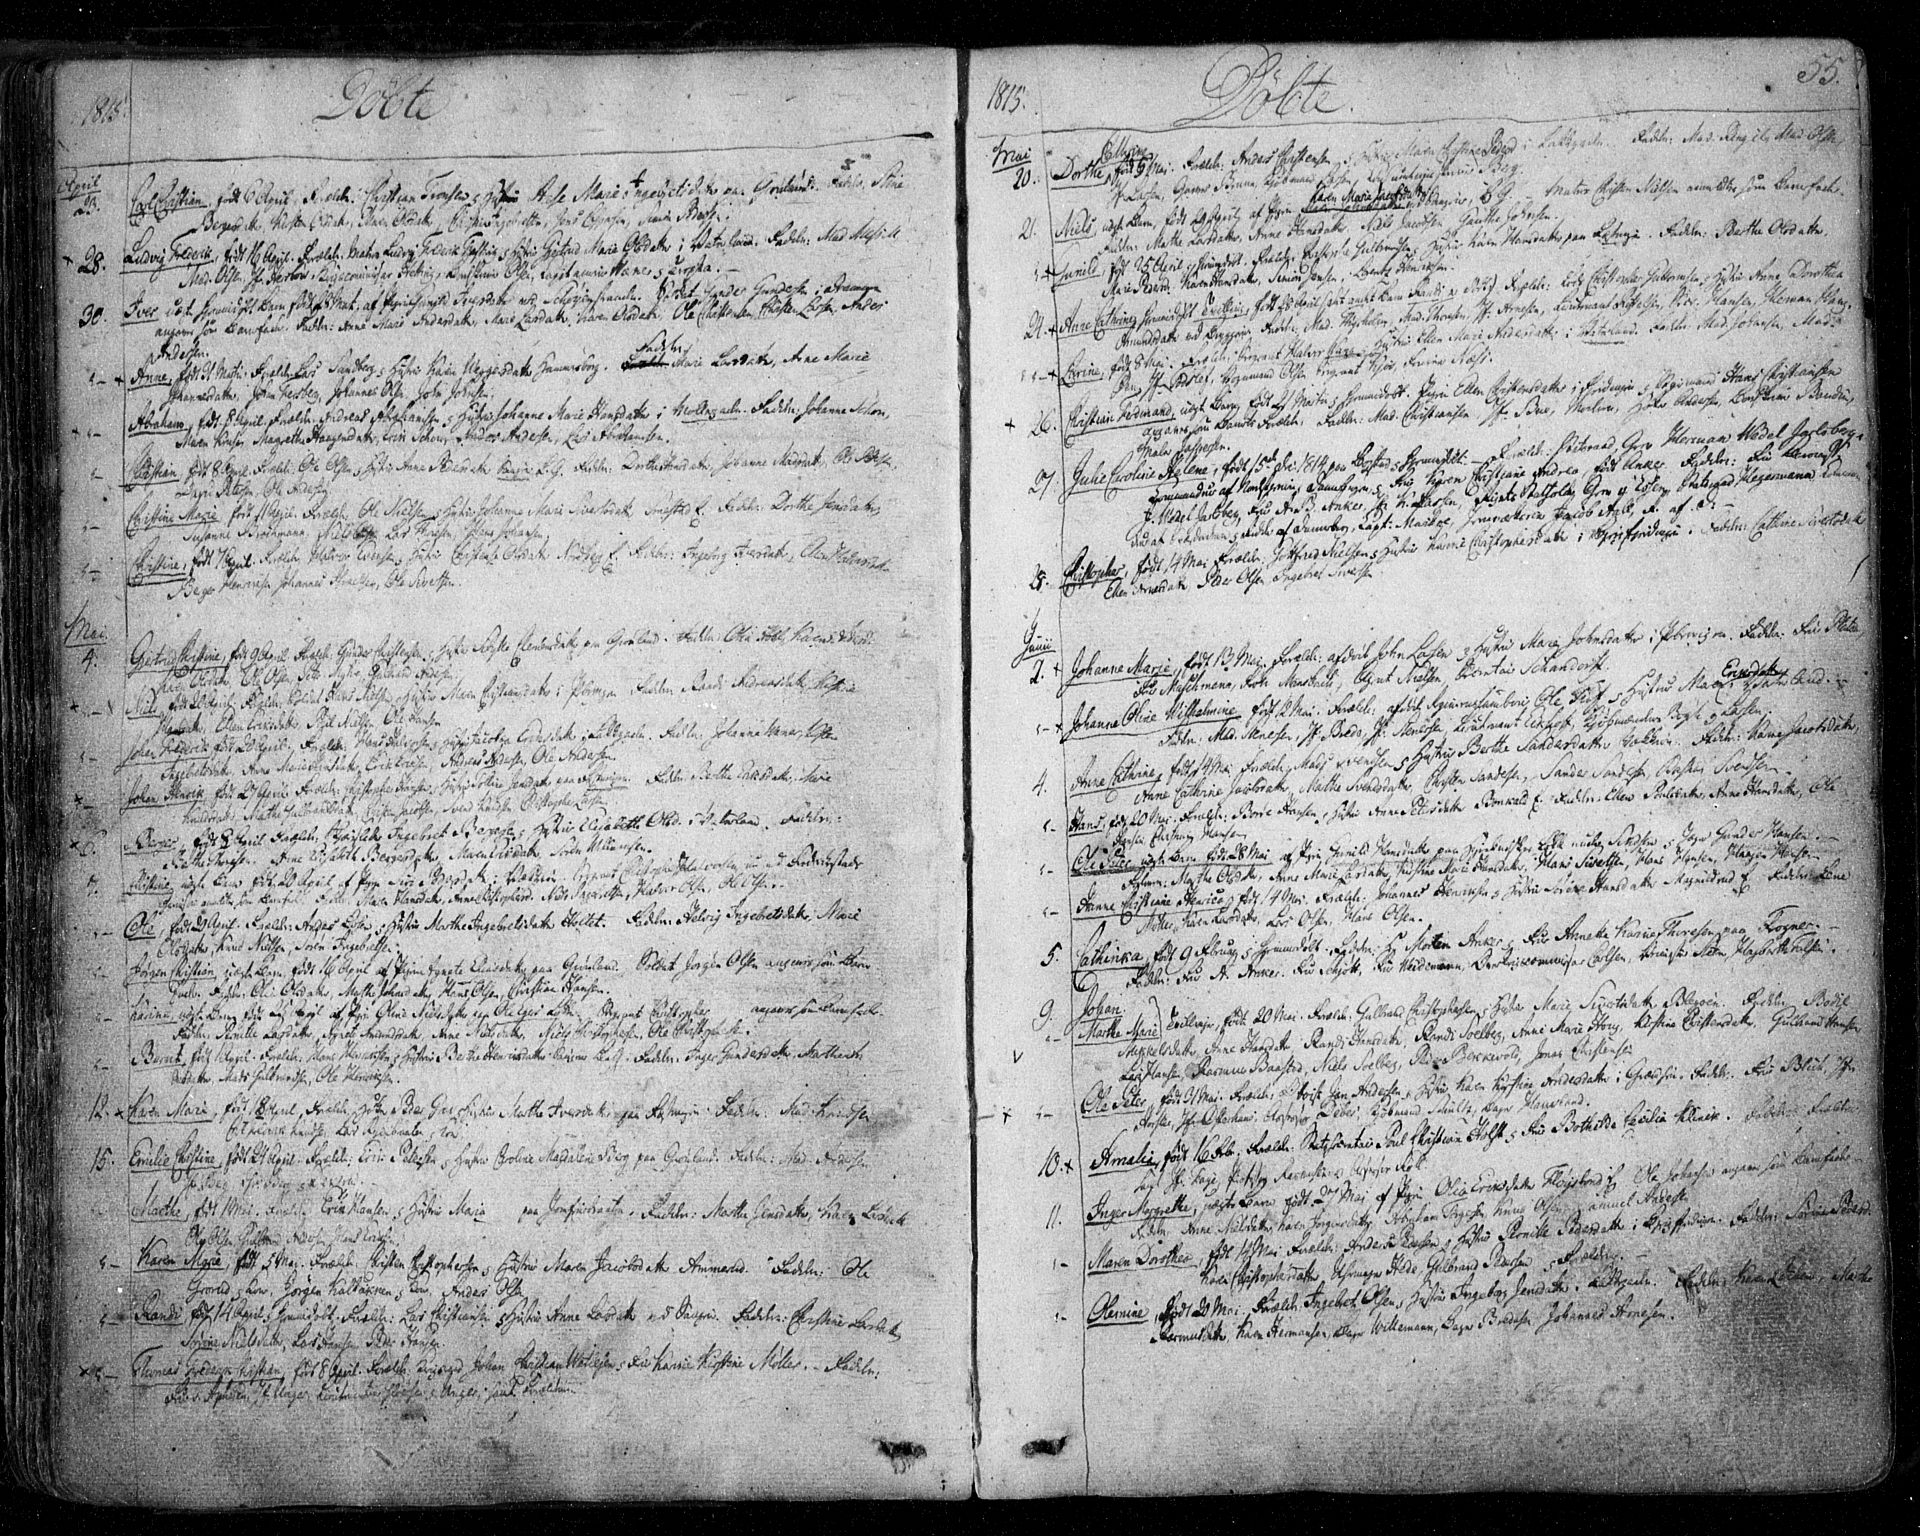 SAO, Aker prestekontor kirkebøker, F/L0011: Parish register (official) no. 11, 1810-1819, p. 55